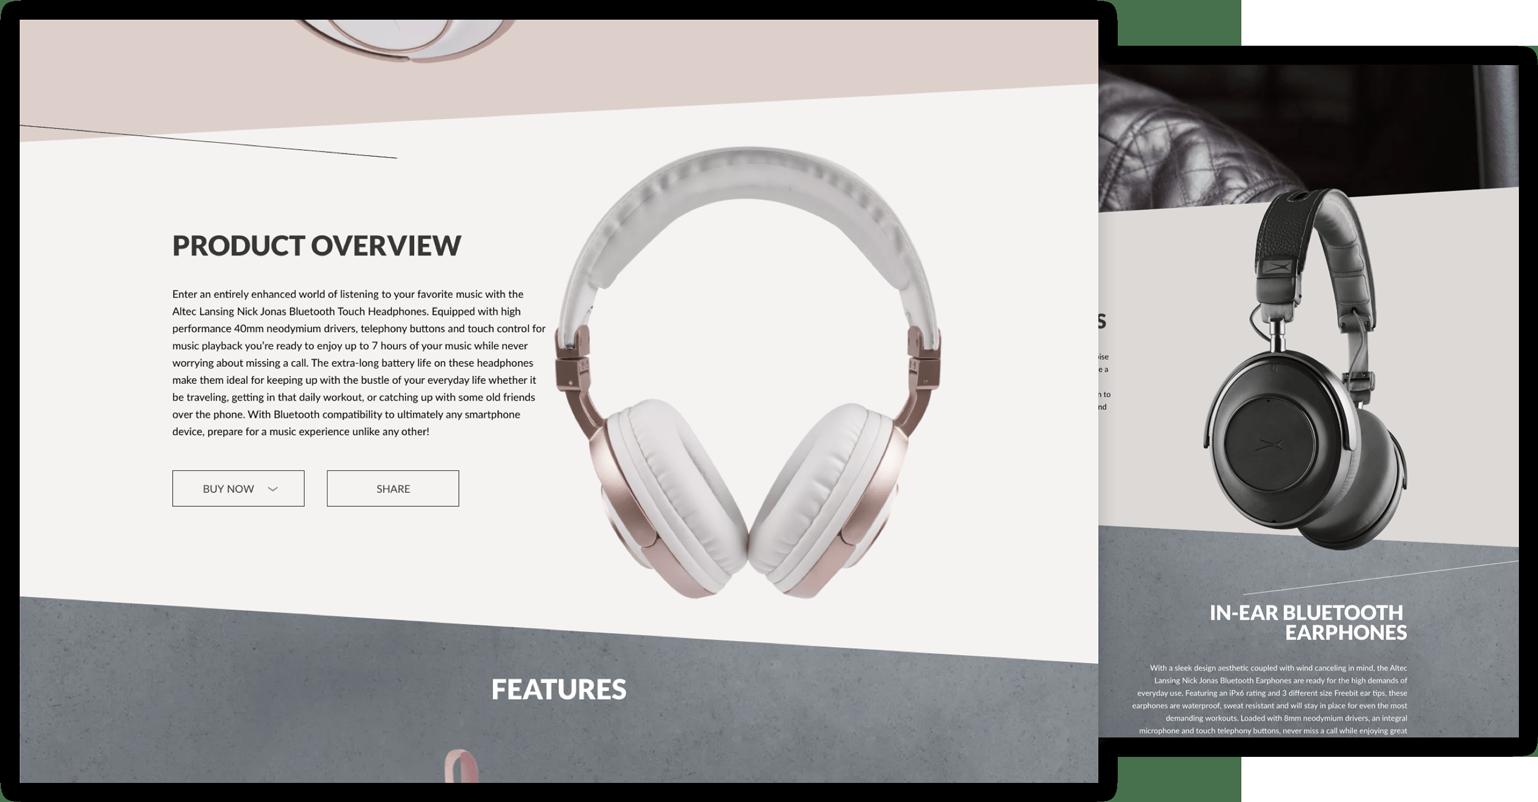 Web Design & Development Work New York | Responsive Digital